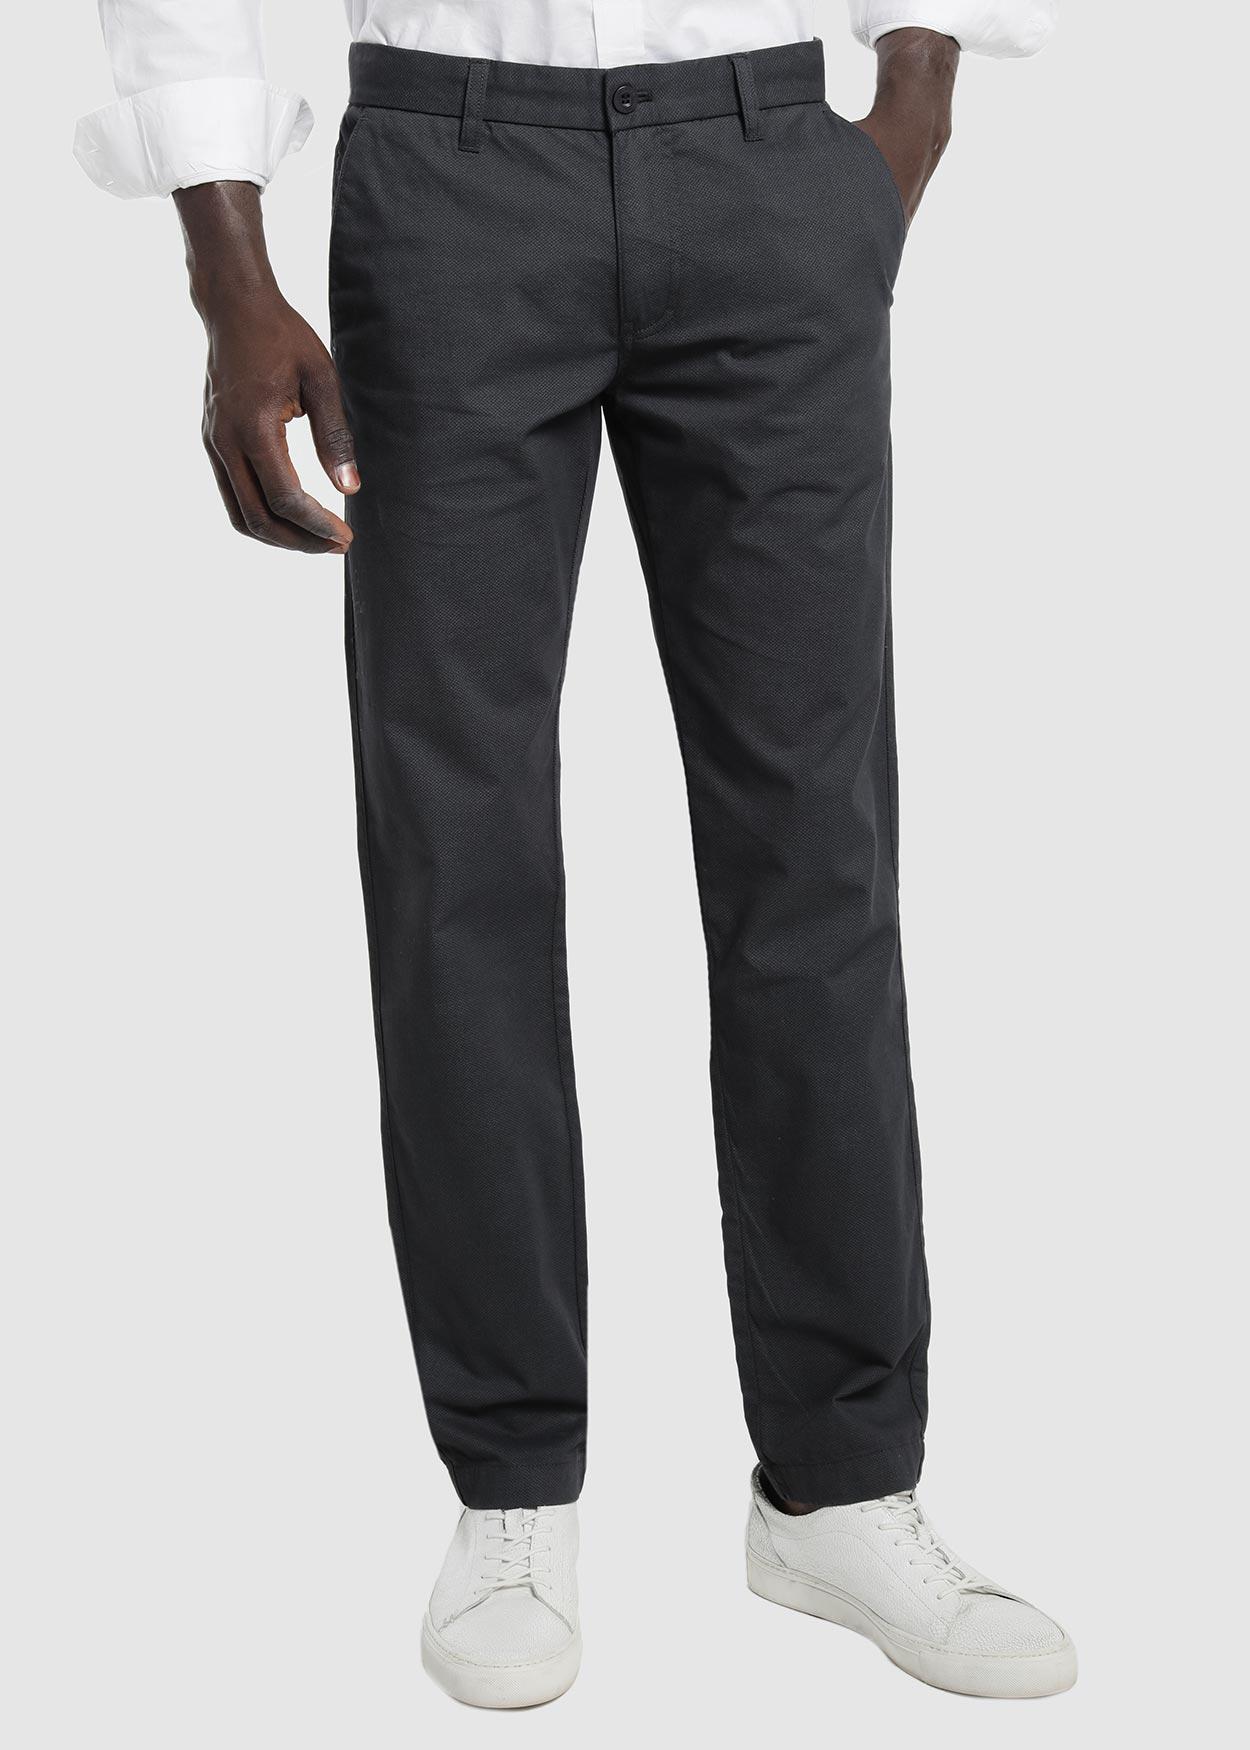 Comprar Lois Chinês-Micro-calças cinzentas